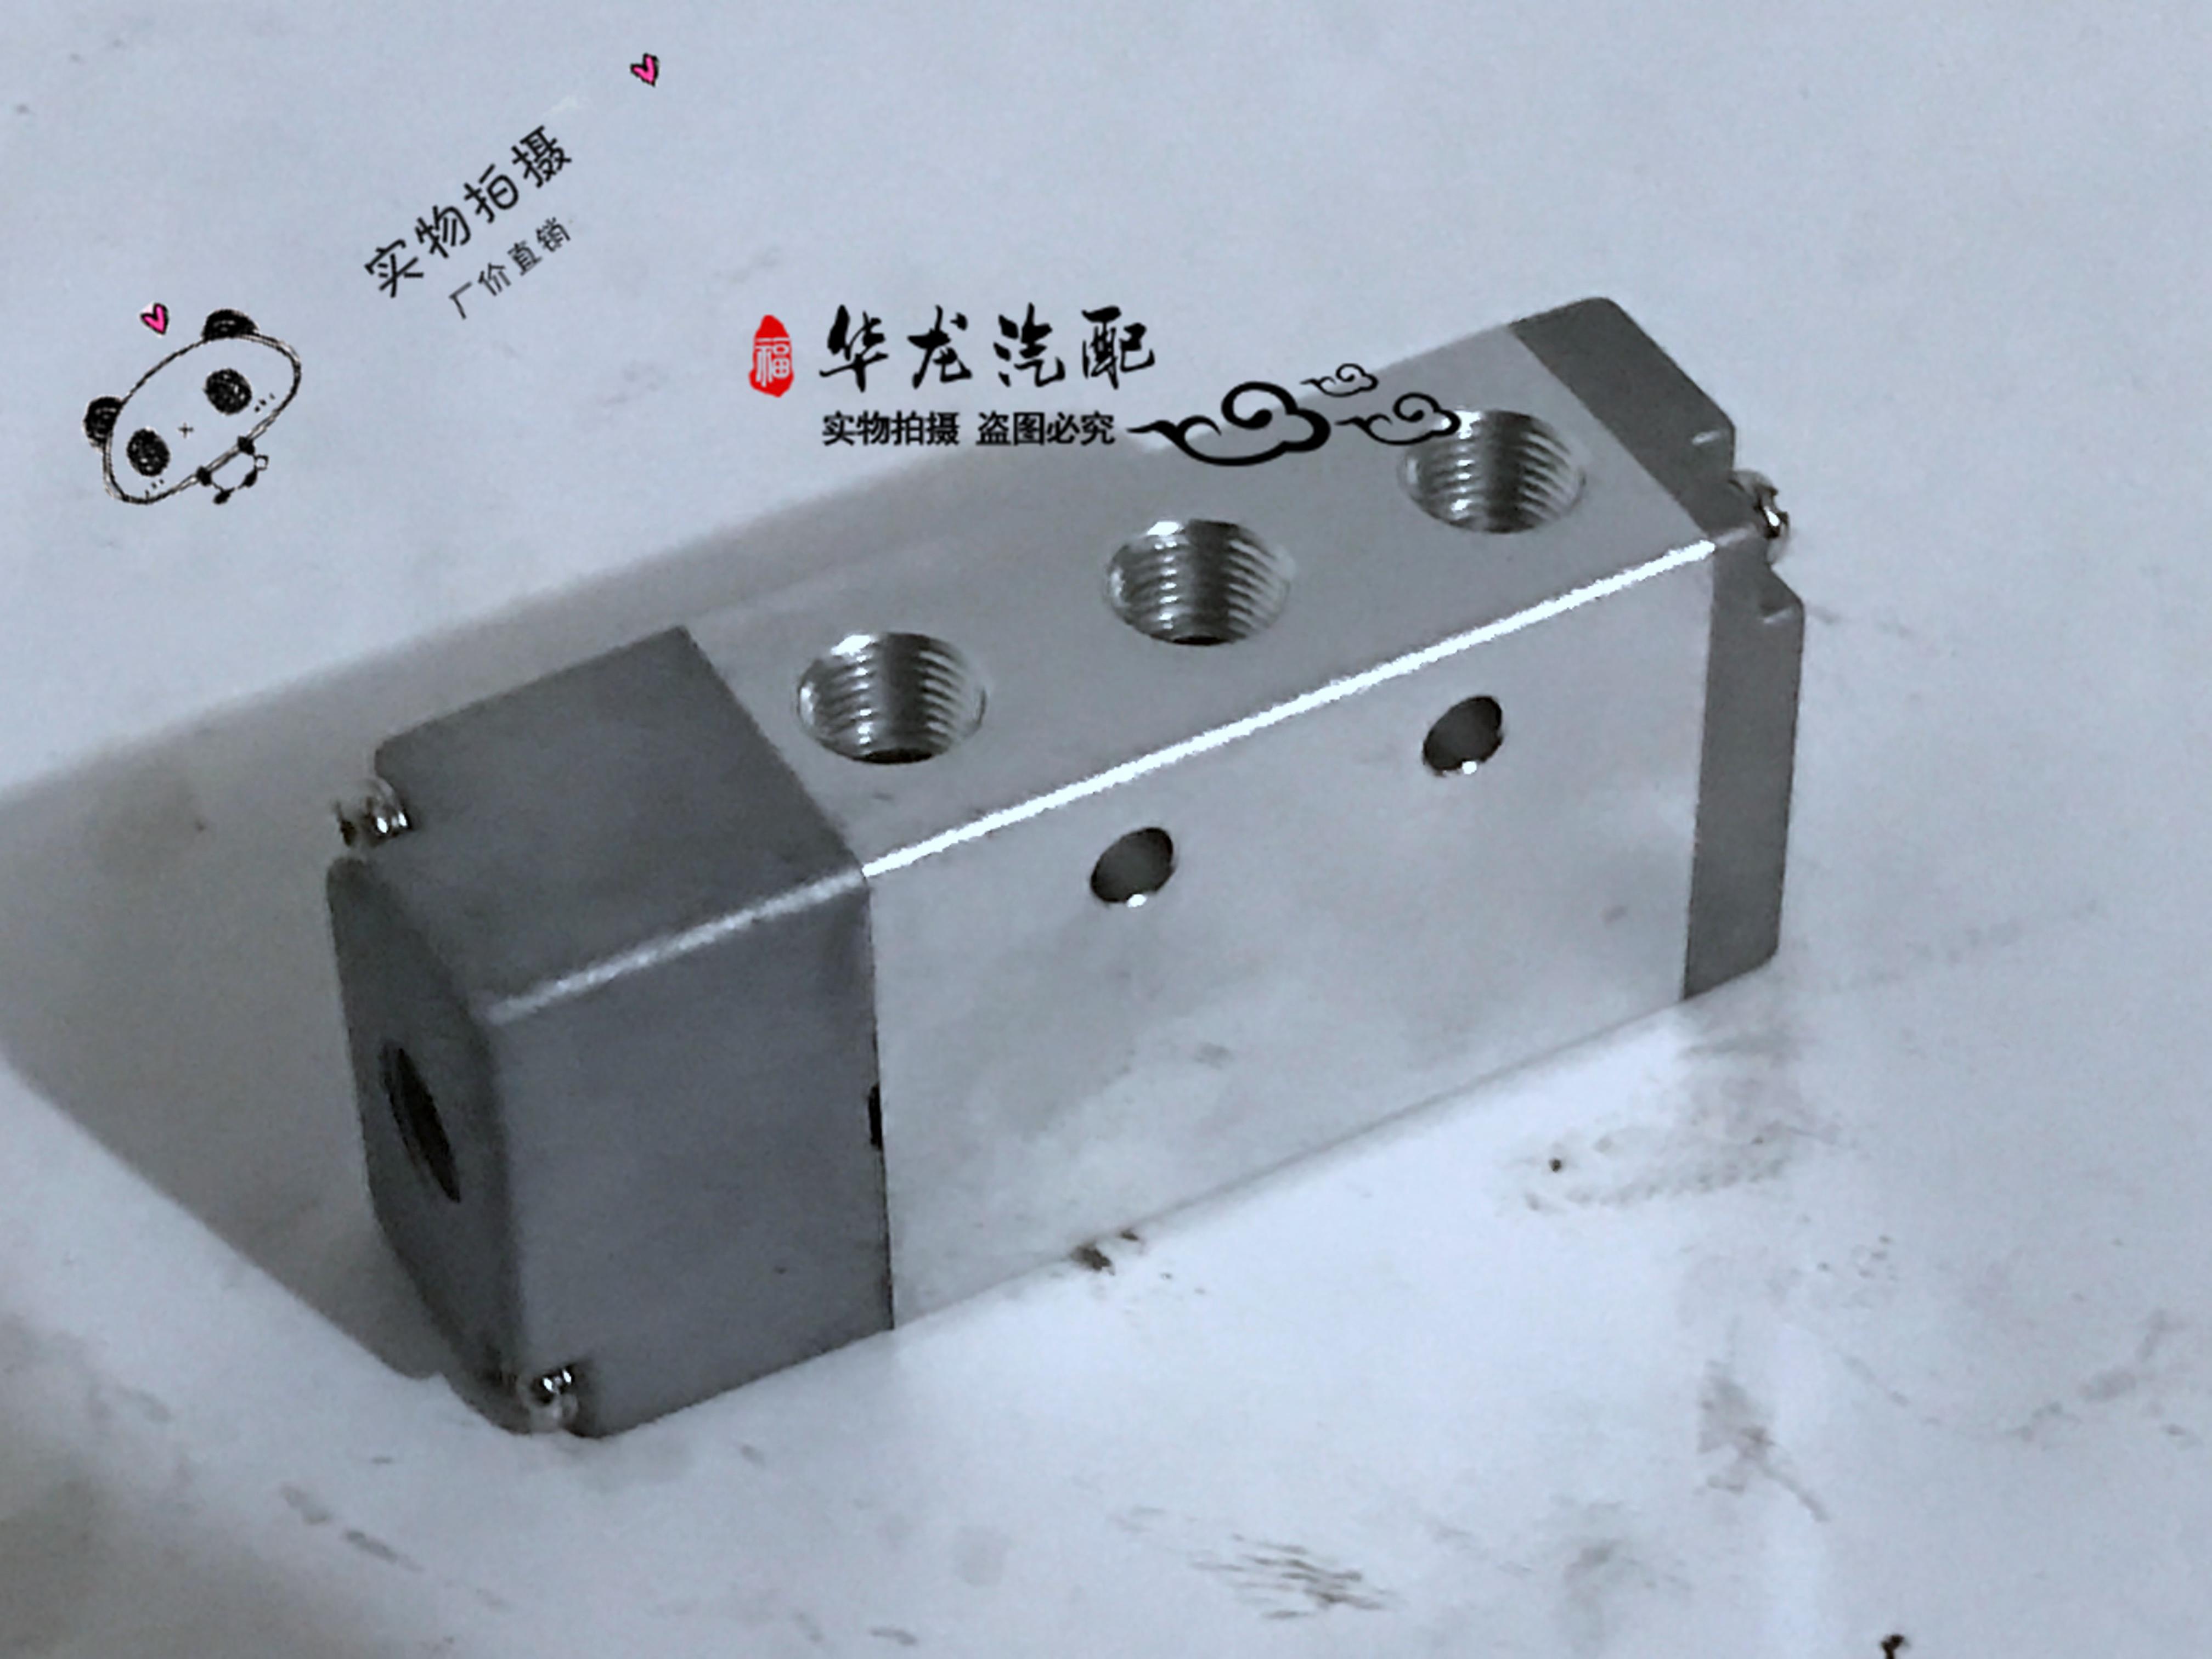 Fast gear box gear 12 single H double H valve valve gas control valve 12JS160T-1703052